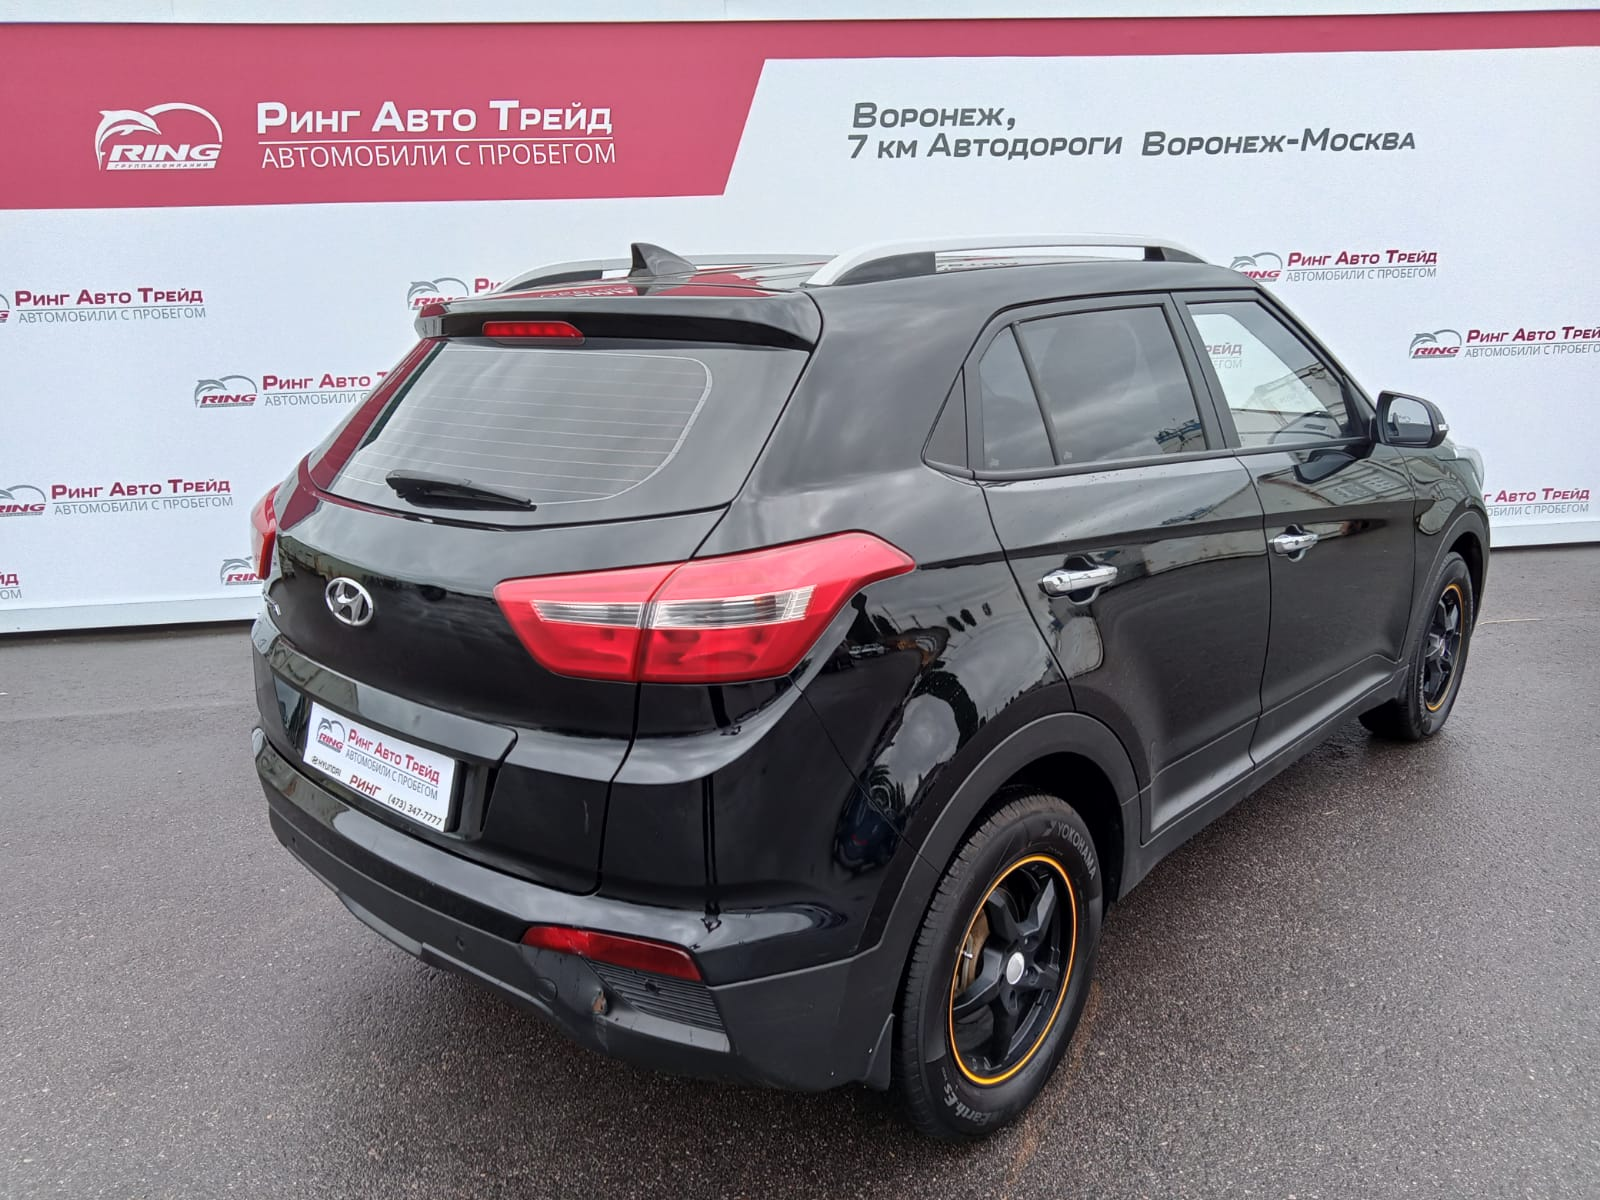 Hyundai Creta Внедорожник (2017г.)